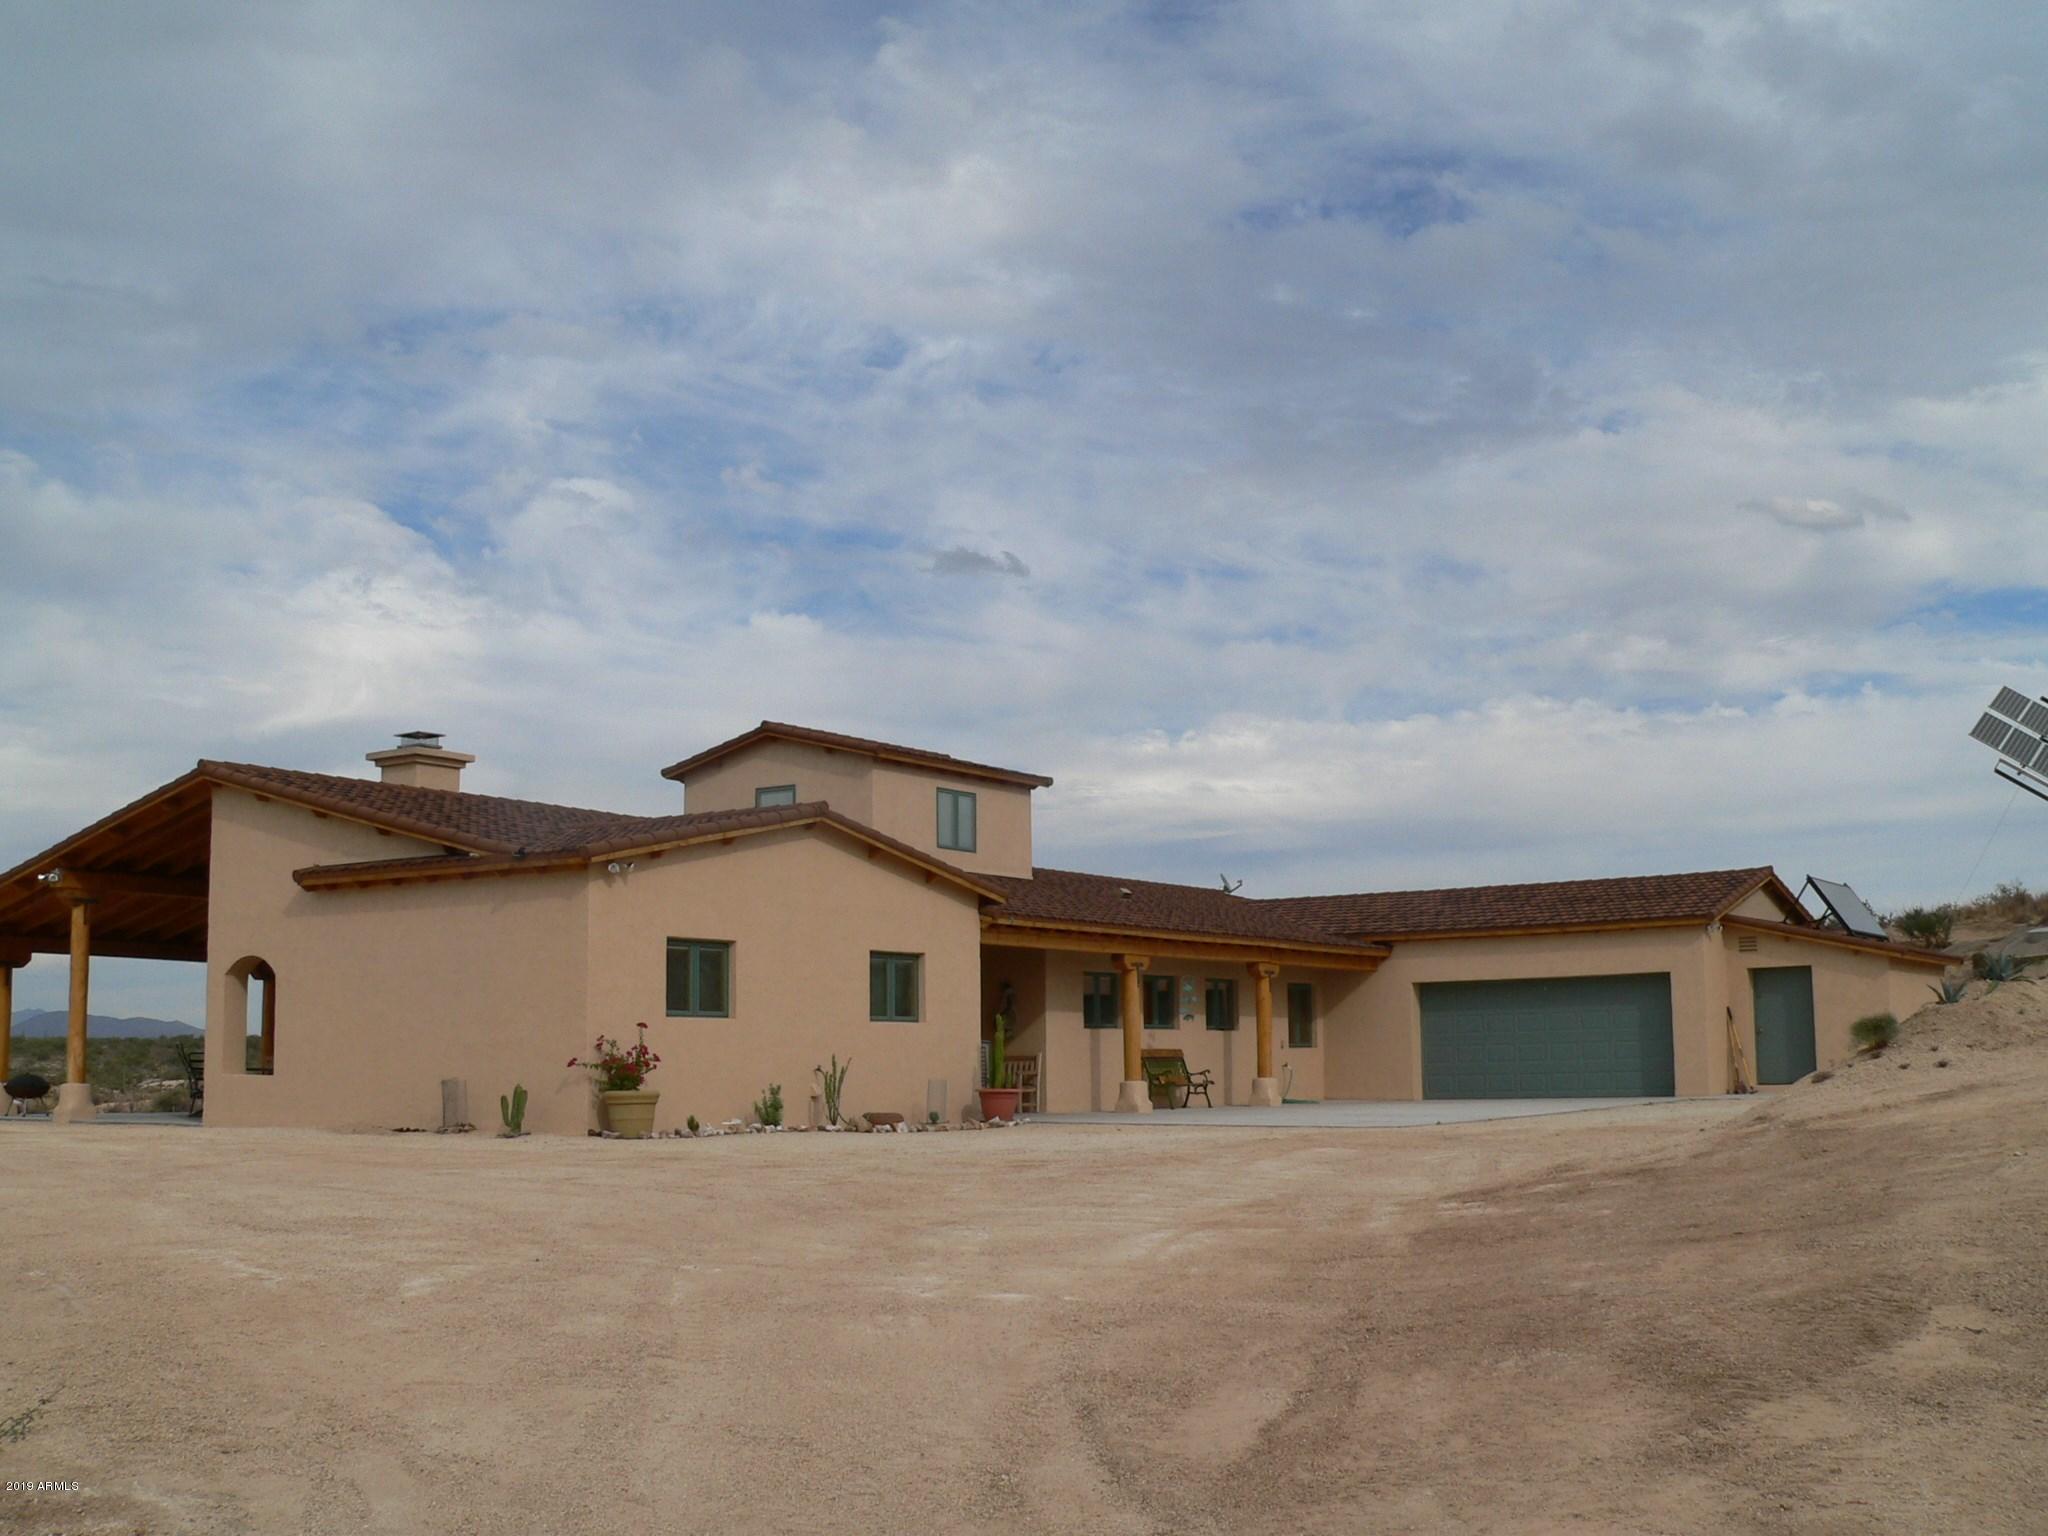 40262 E Florence Kelvin Highway, Florence, Arizona 85132, 2 Bedrooms Bedrooms, ,2 BathroomsBathrooms,Single Family,For Sale,40262 E Florence Kelvin Highway,1,6018423